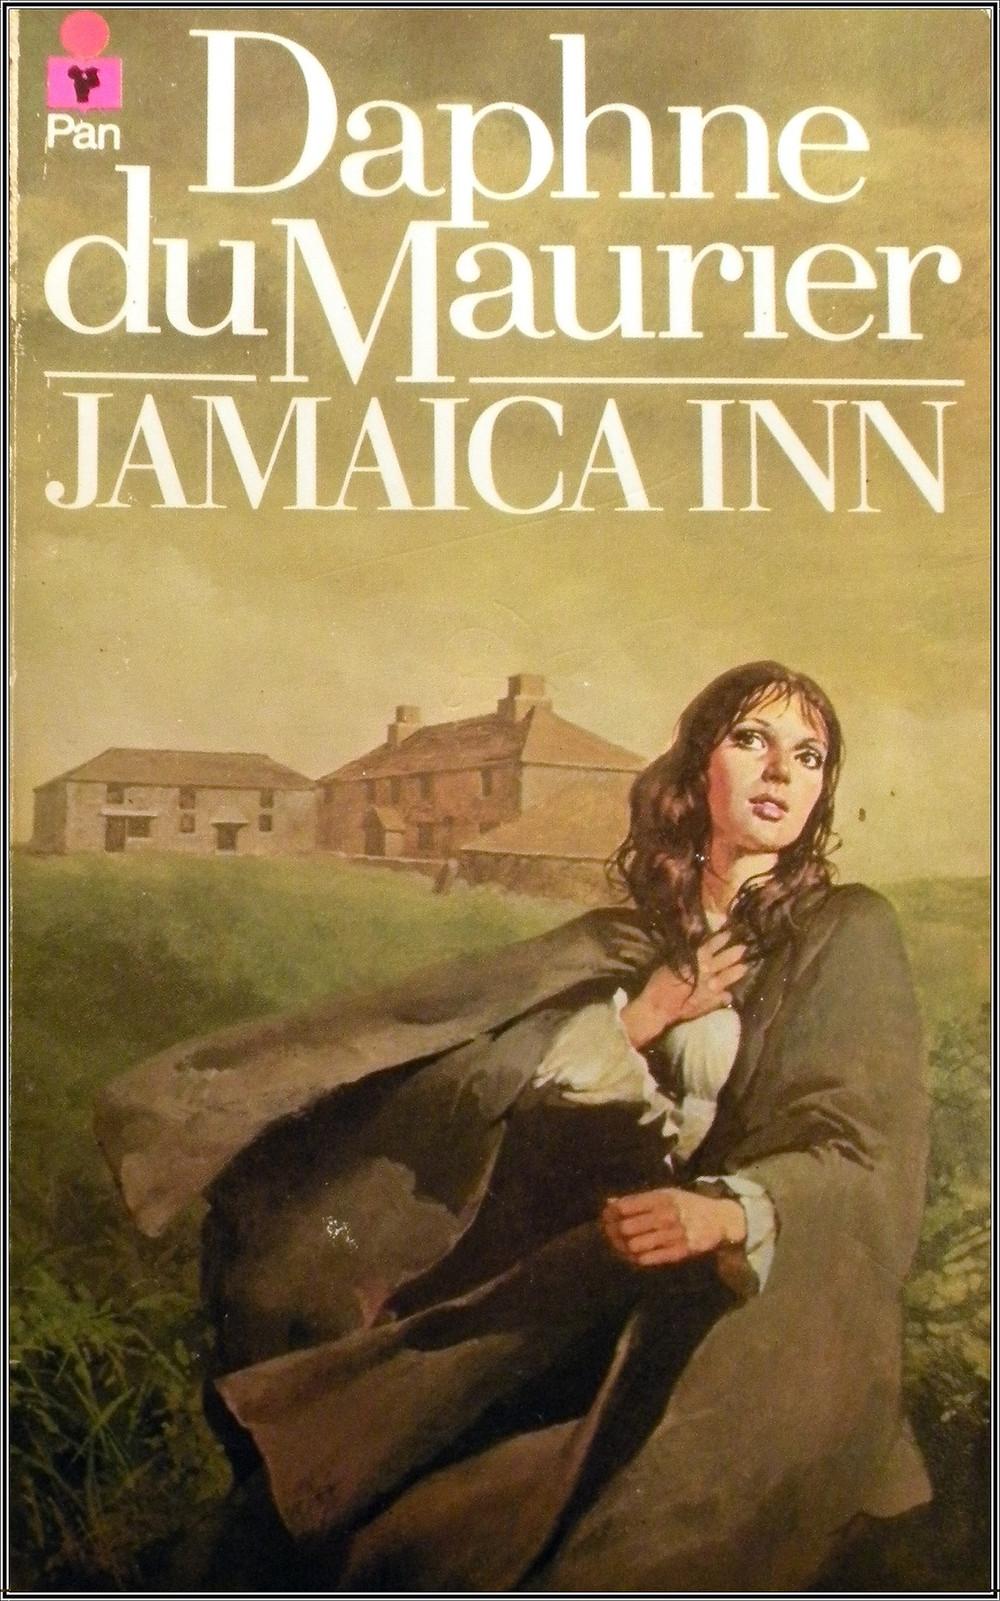 Jamaica Inn by Daphne du Maurier : the book slut friday book debrief thebookslut book reviews